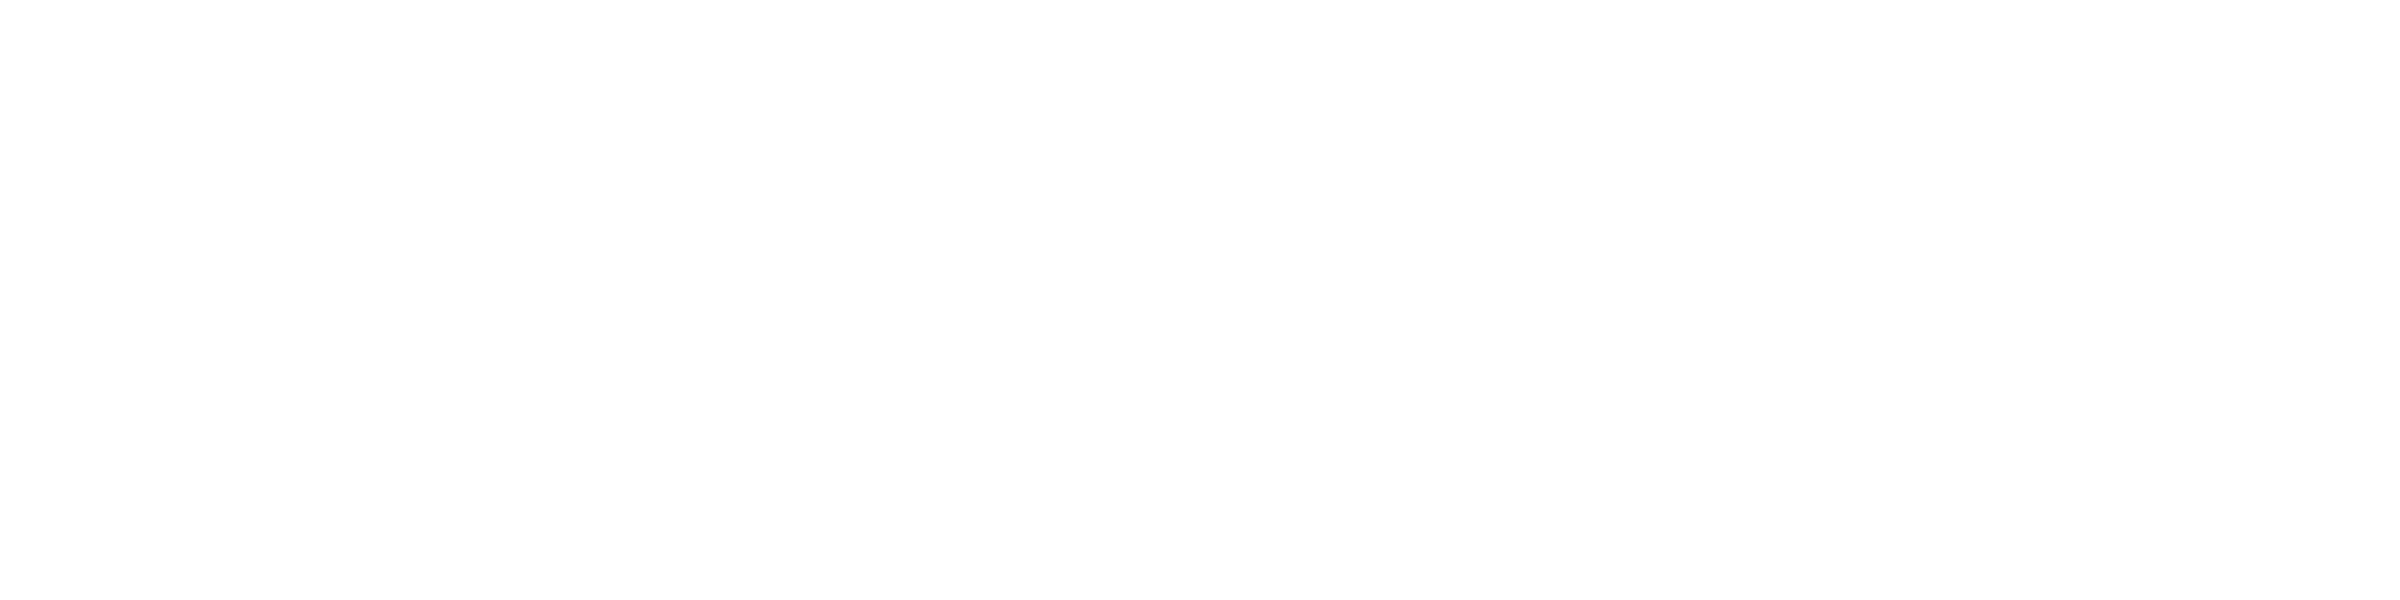 Piedra Law Injury Attorneys